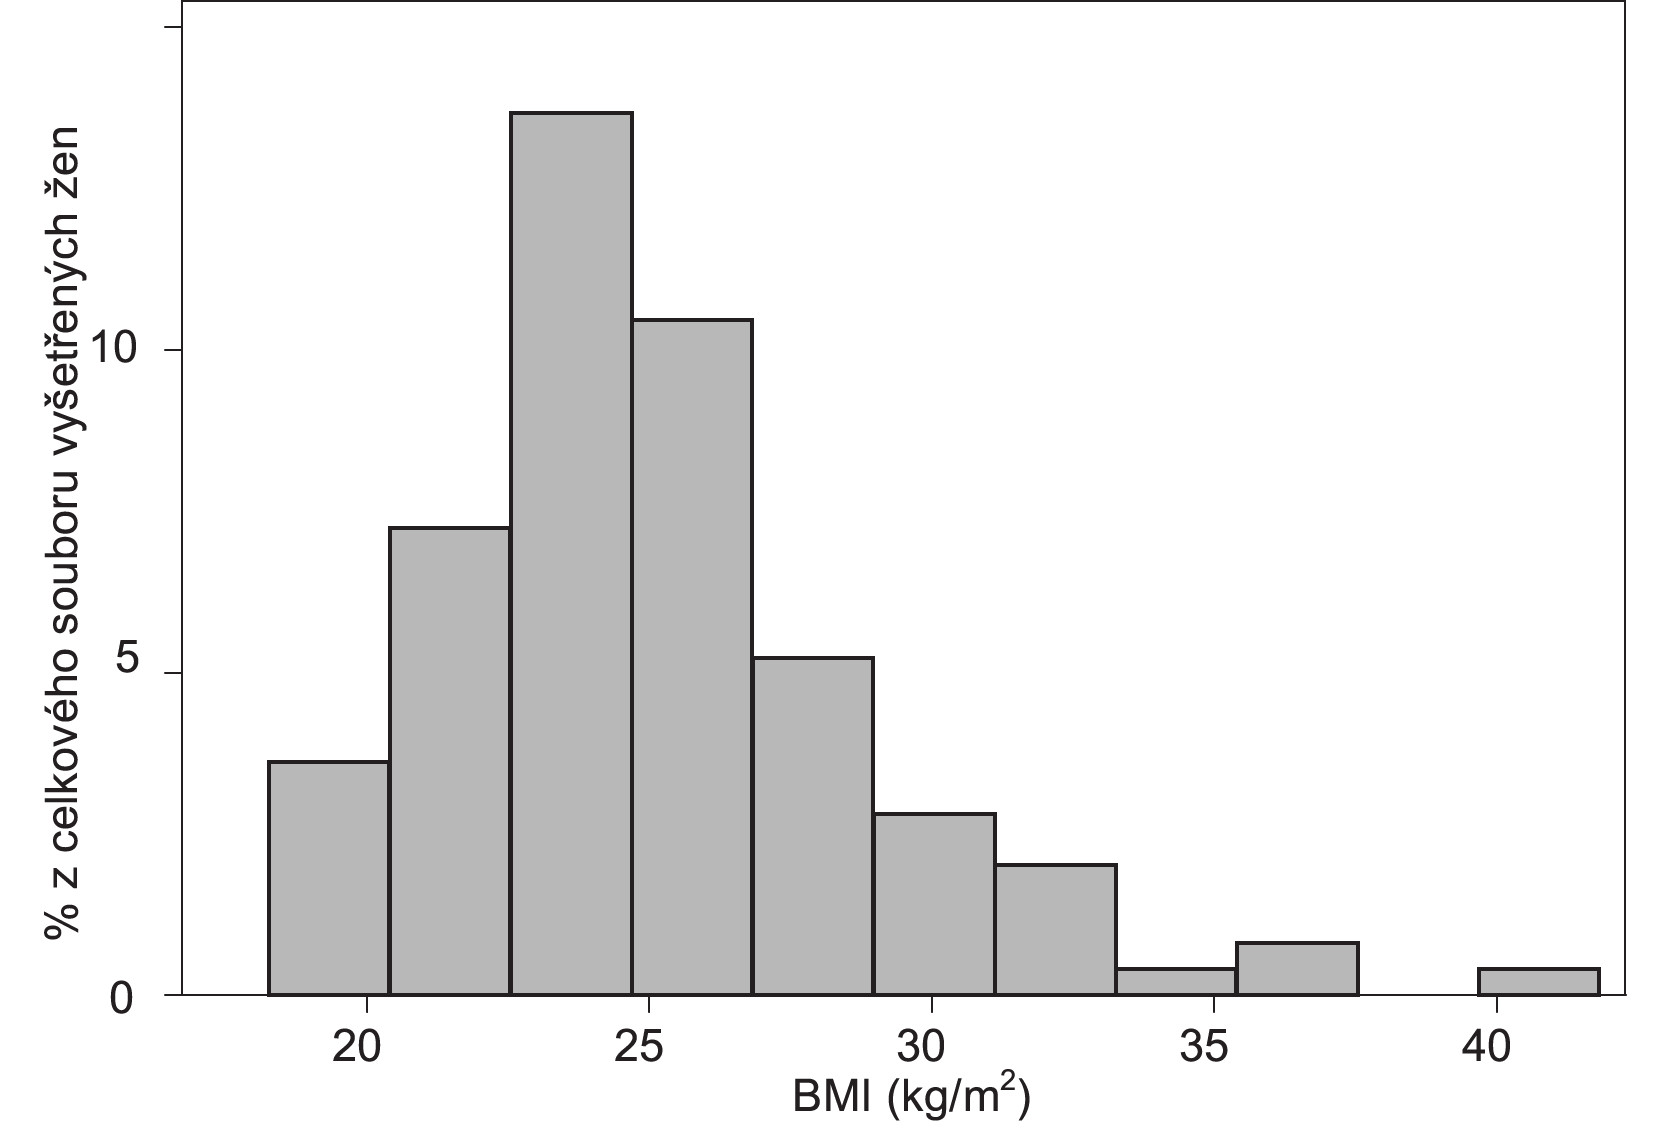 Histogram rozložení četnosti hodnot BMI u souboru 116 pacientek